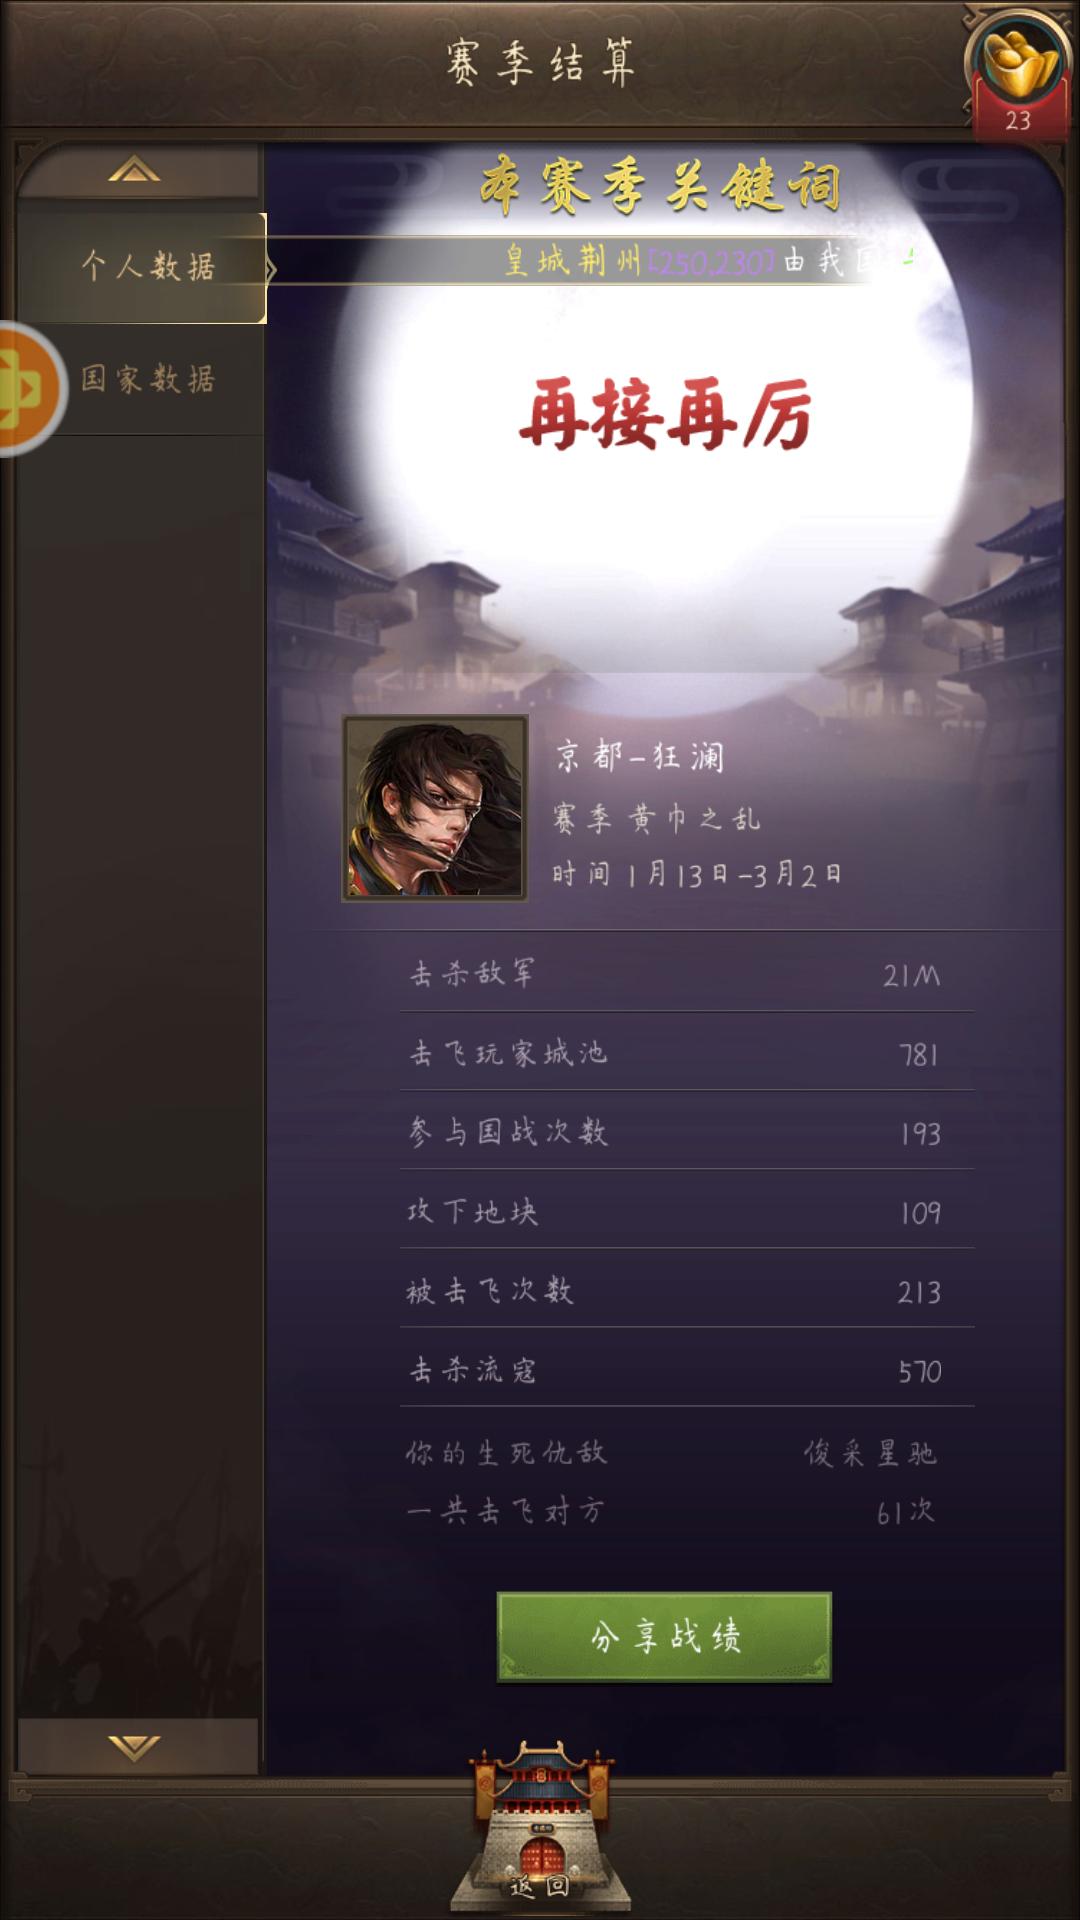 Screenshot_2020-03-02-20-30-21-58.png